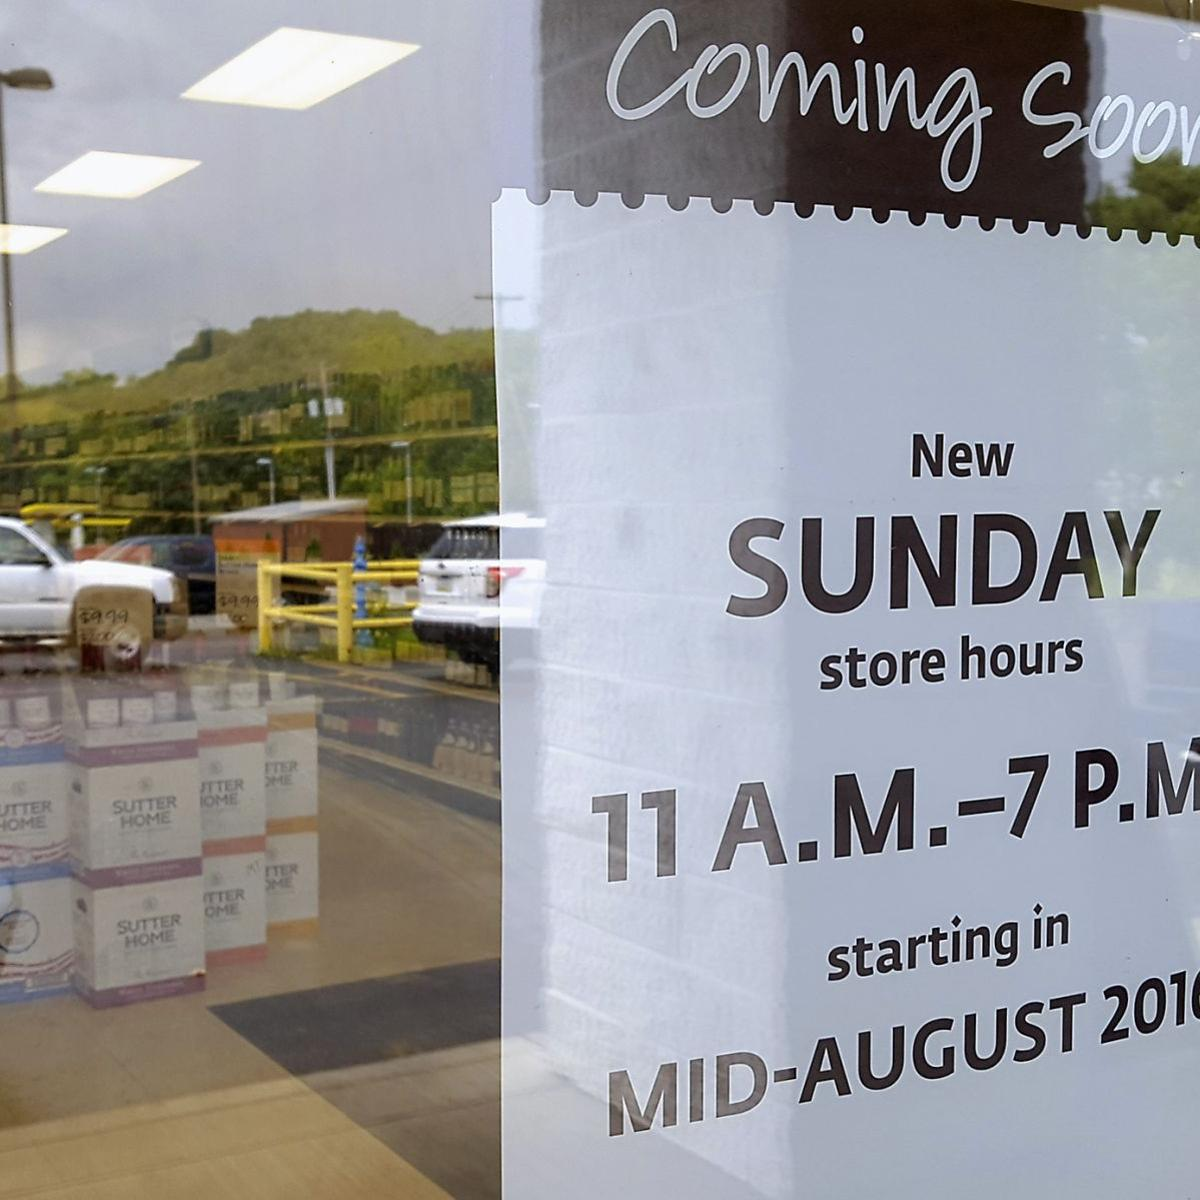 State Liquor Stores In Waynesburg Belle Vernon Now Open On